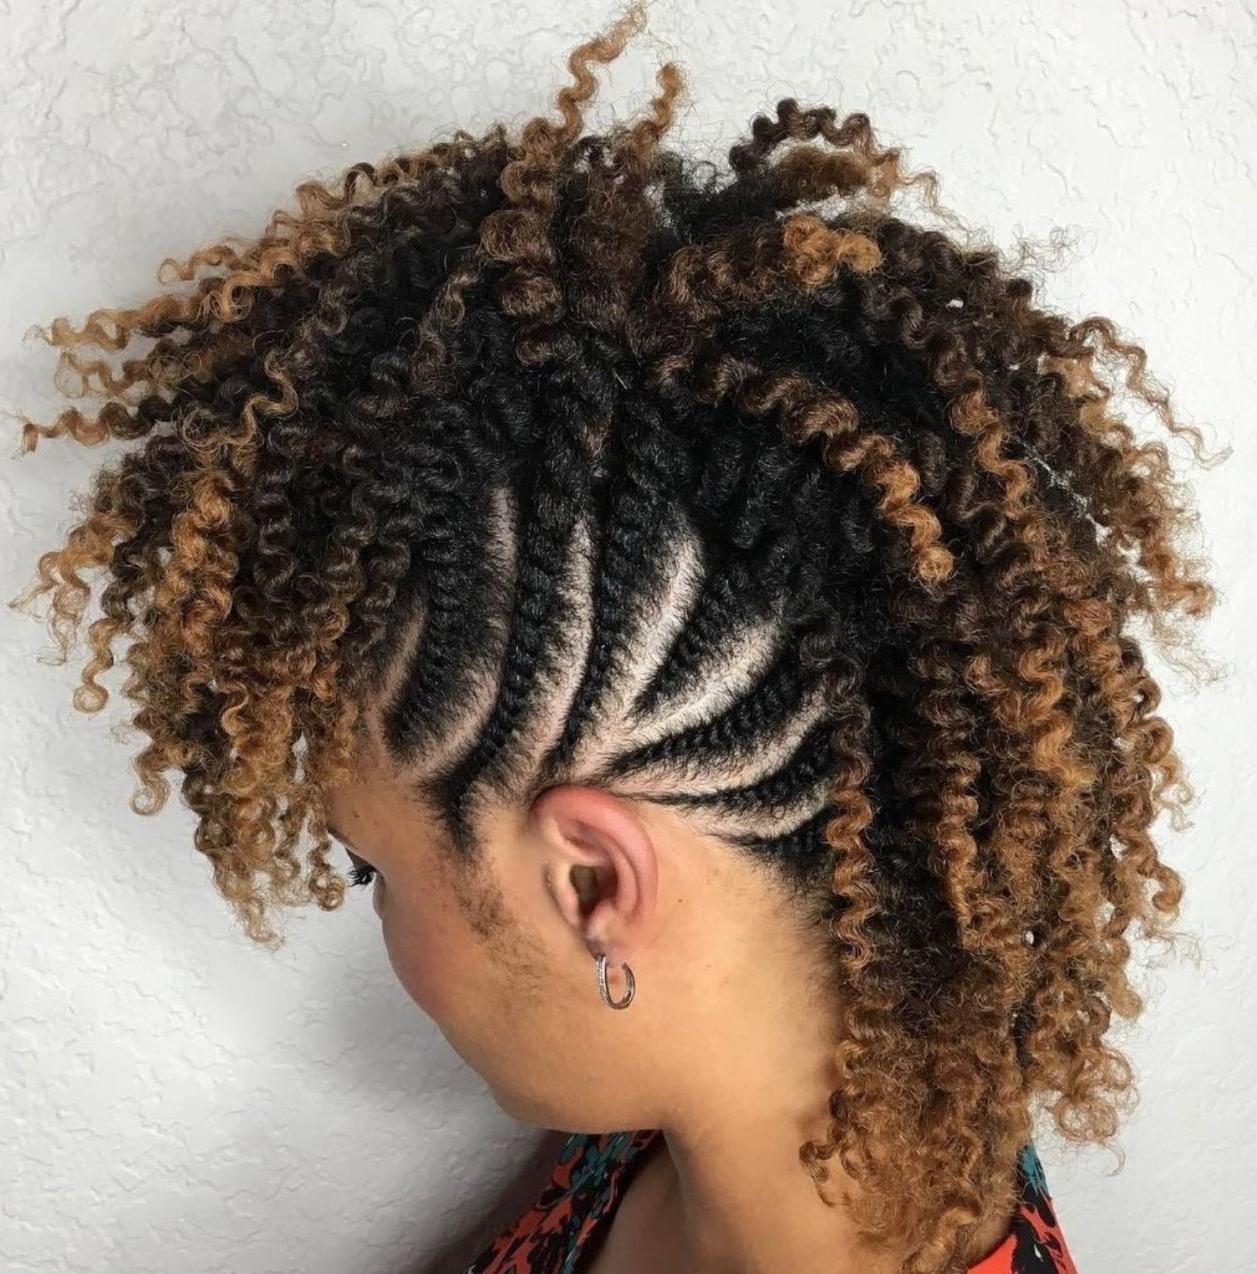 Braids To Throughout Favorite Short Blonde Braids Mohawk Hairstyles (View 7 of 20)